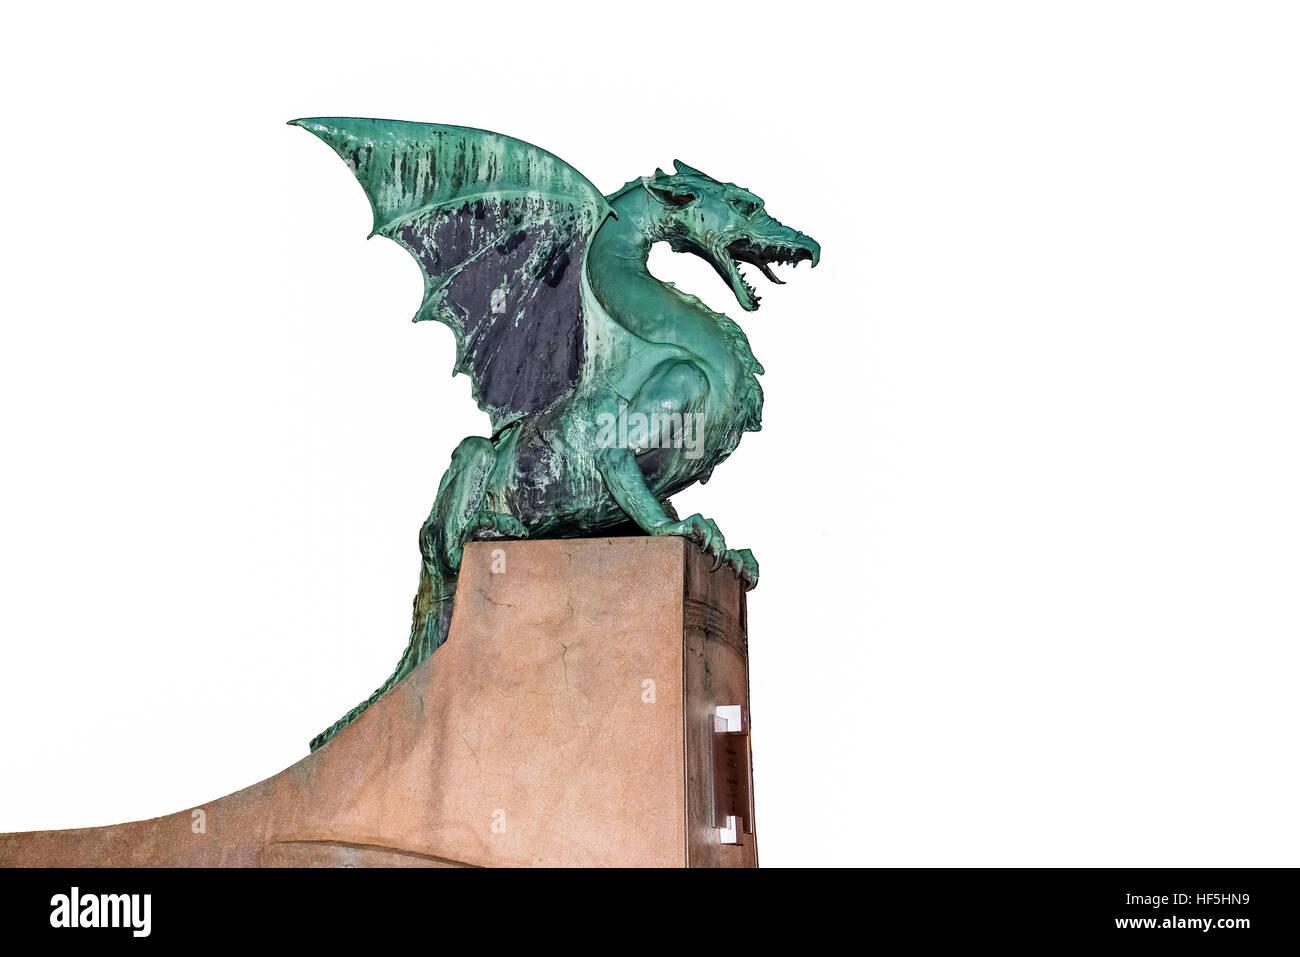 Dragon statue on the dragon bridge in ljubljana popular tourist dragon statue on the dragon bridge in ljubljana popular tourist landmark and symbol of ljubljana biocorpaavc Image collections